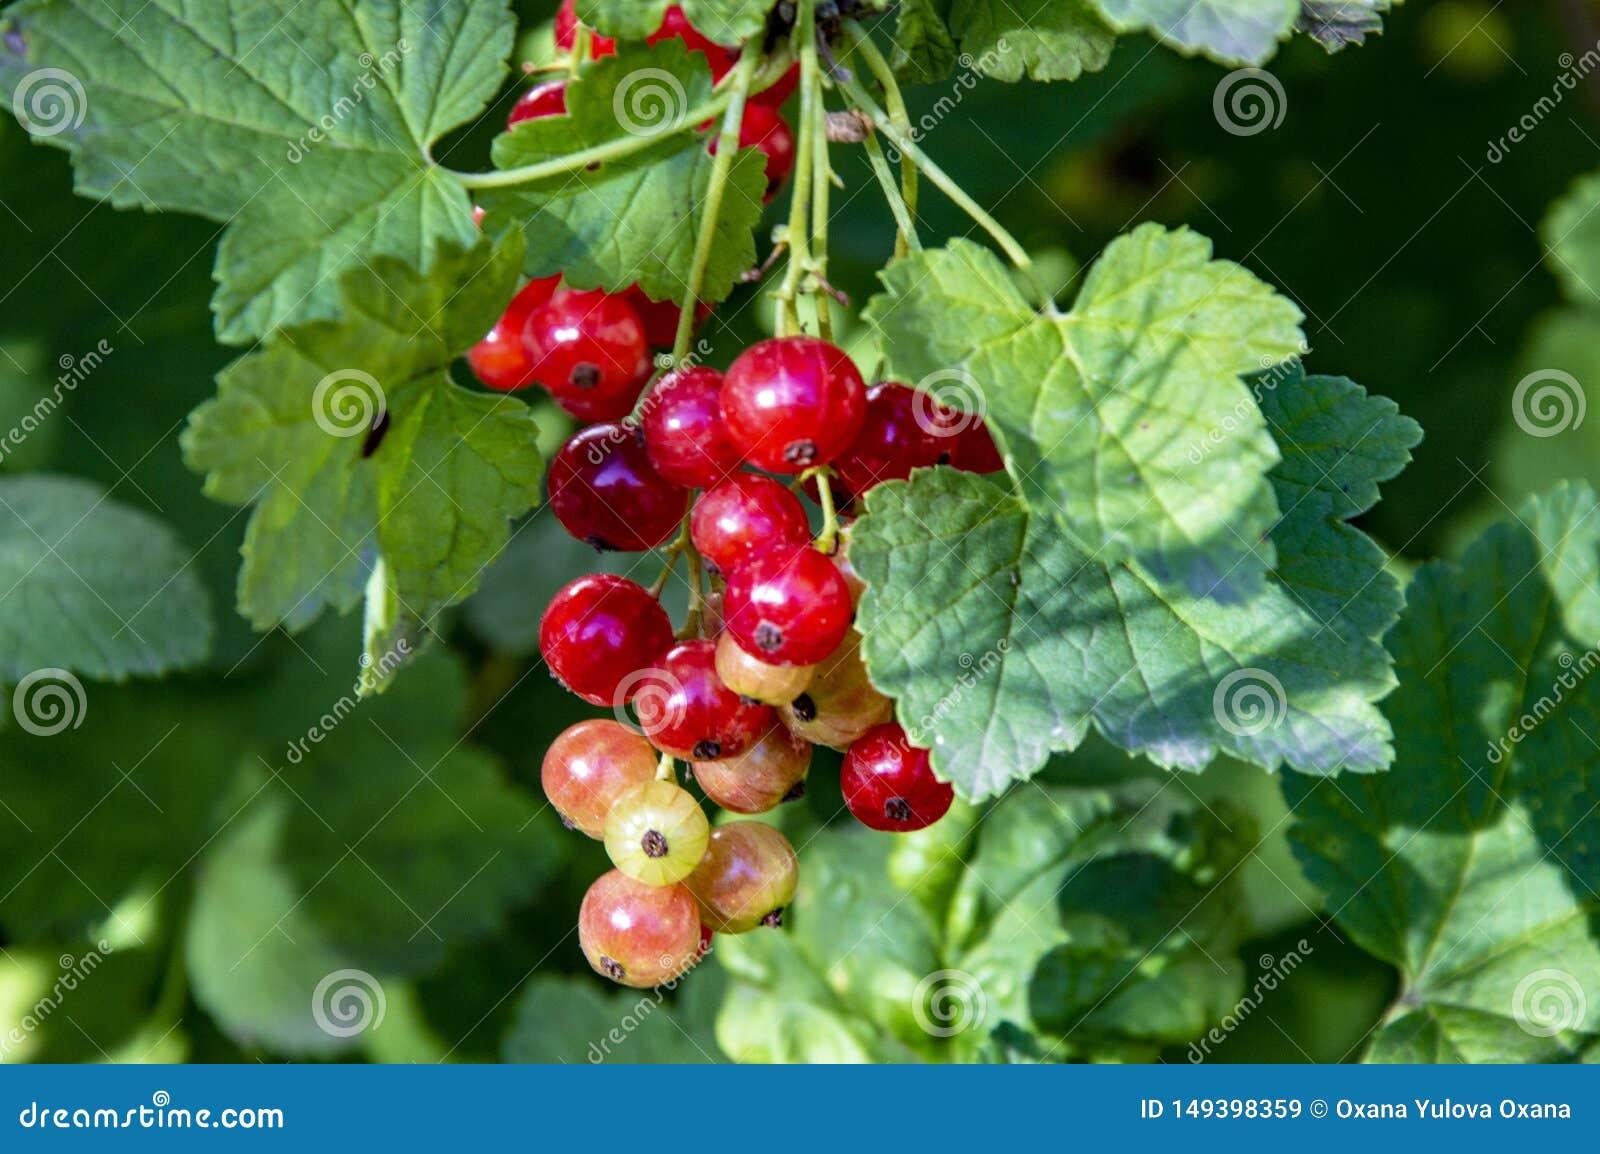 Red currant berries macro